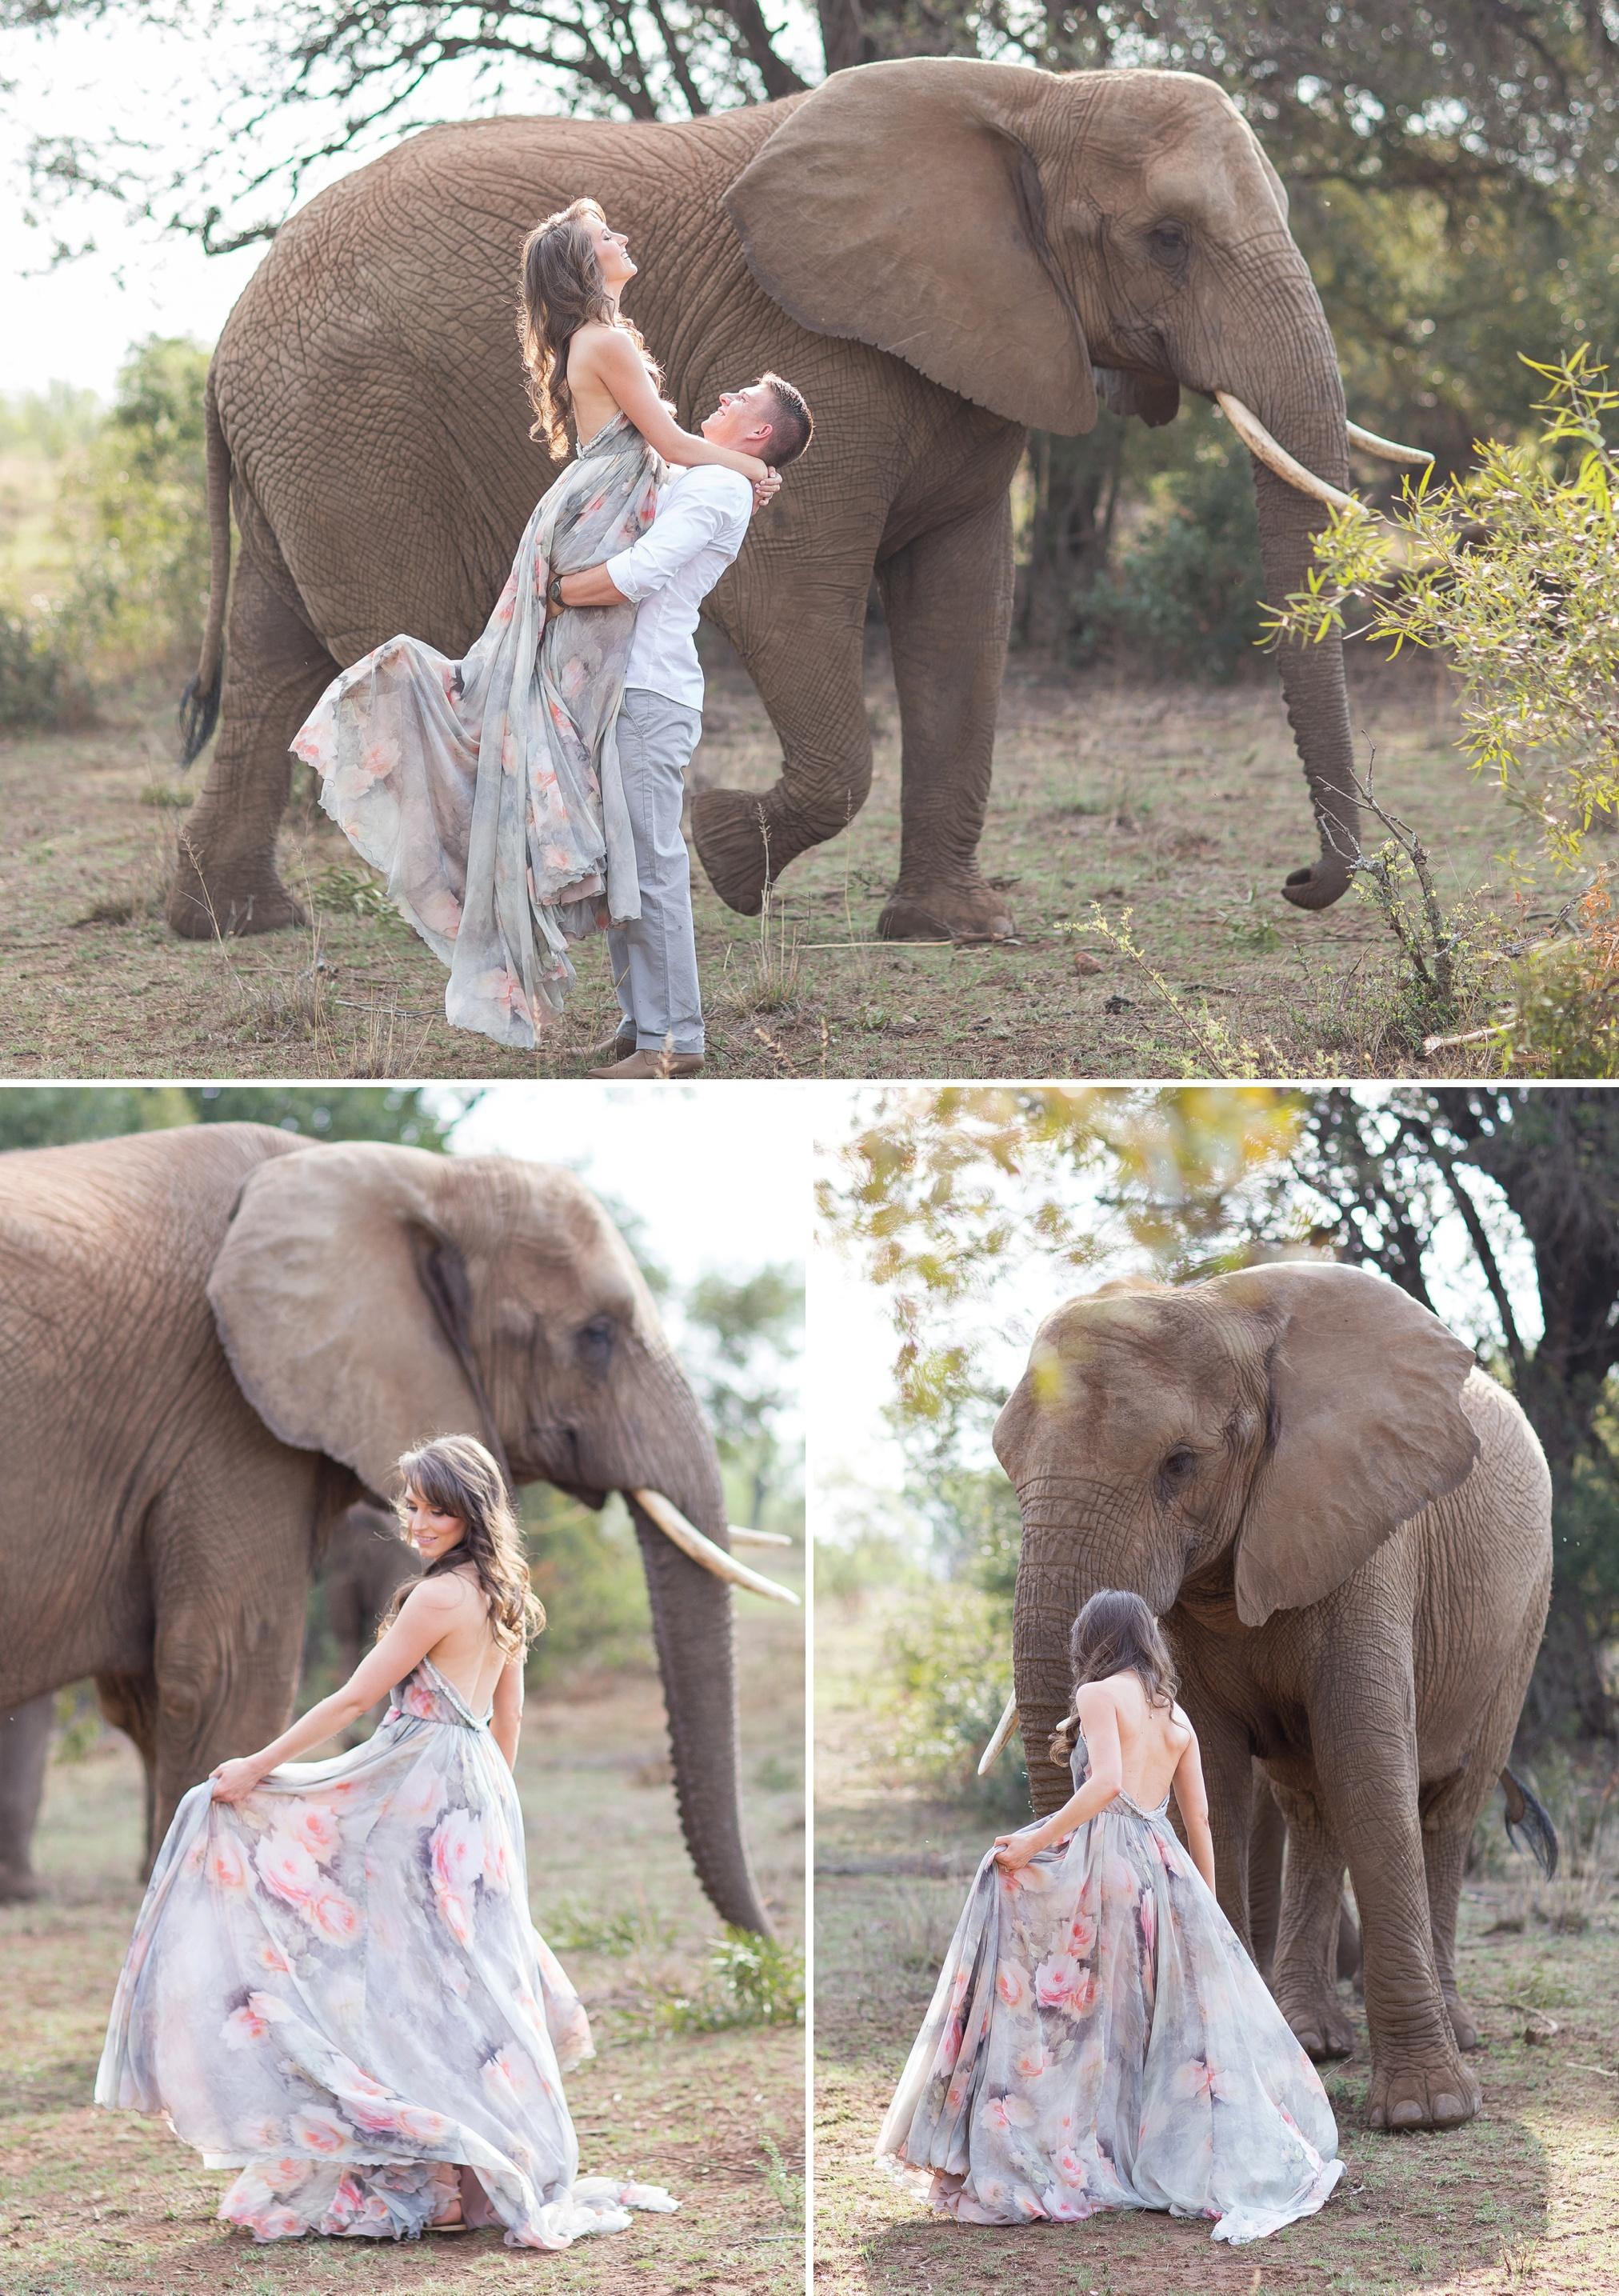 Glen_Afric_Kyle_and_Lindsay_engagement_elephants_safari_12